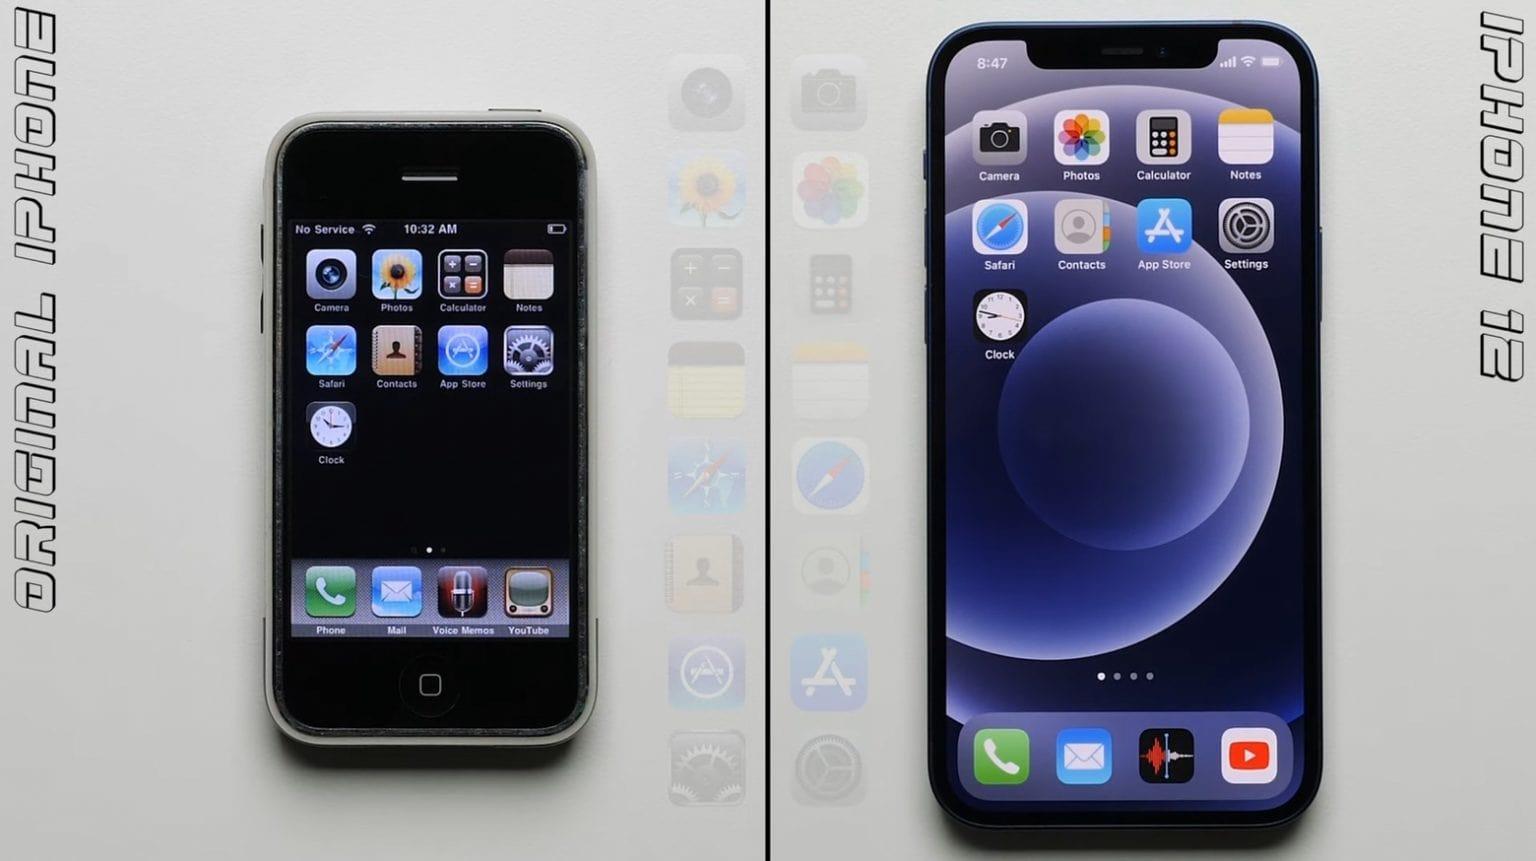 Original iPhone was a complete slug compared to iPhone 12